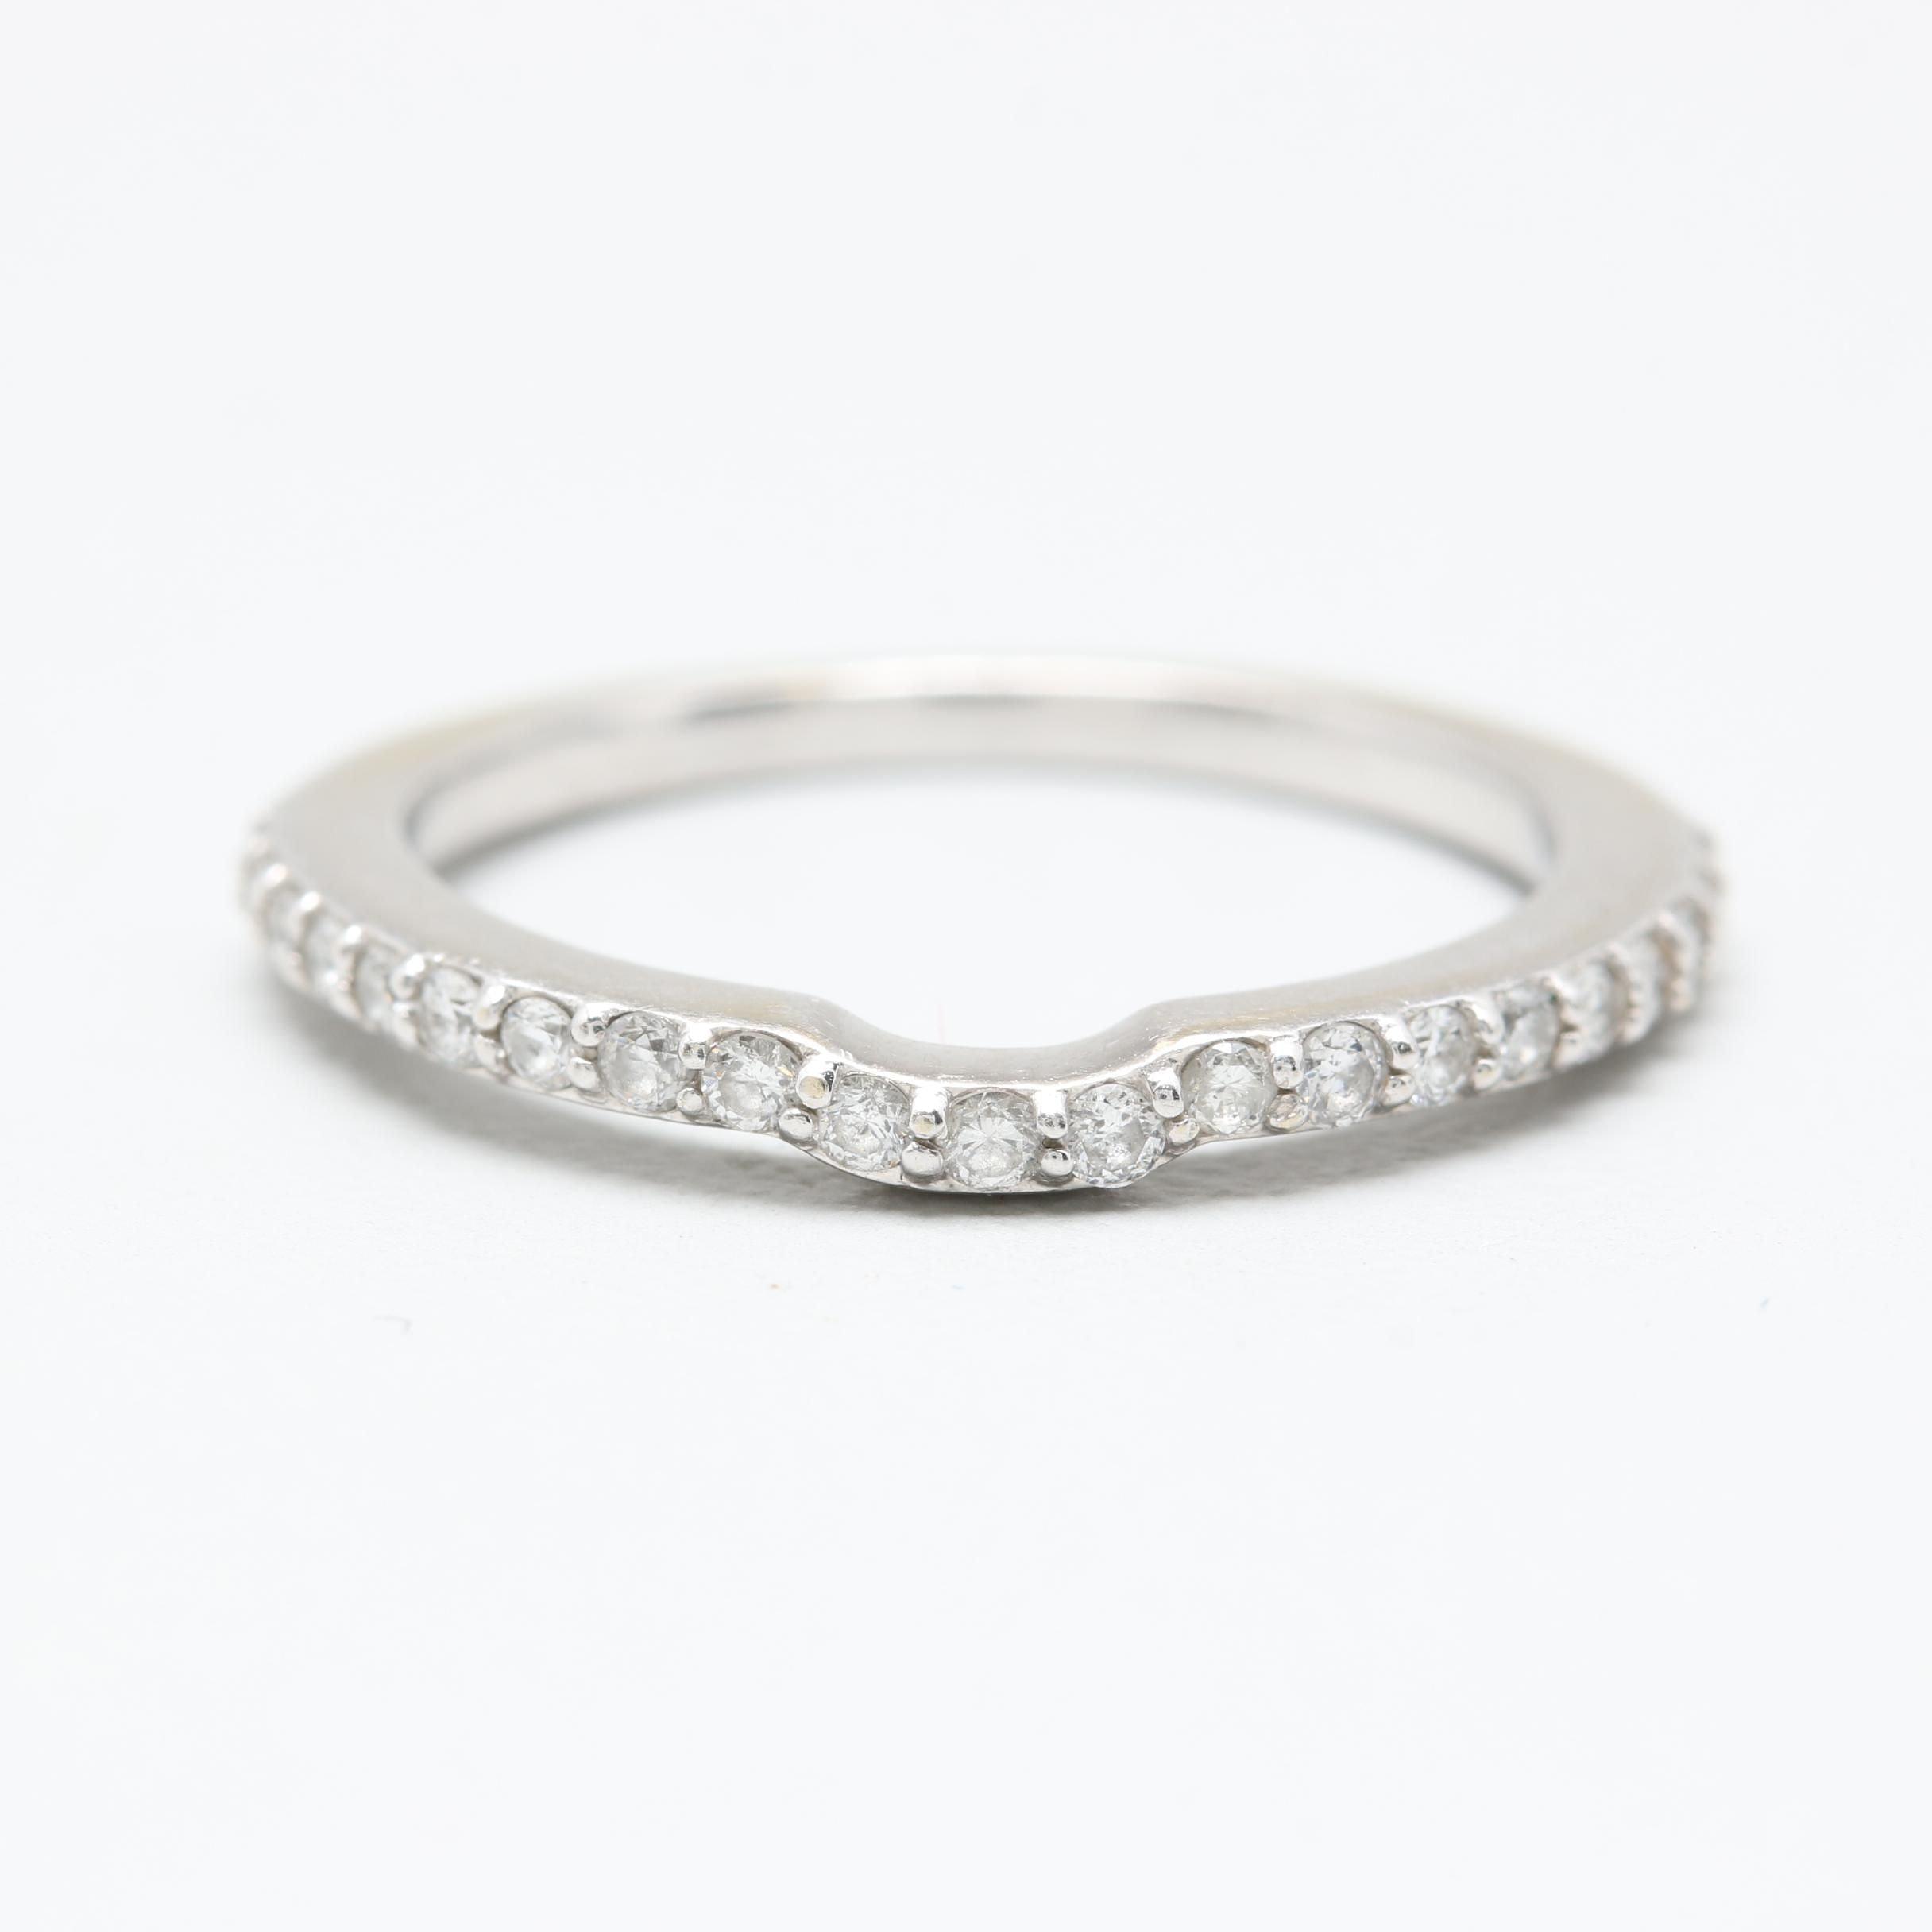 14K White Gold Diamond Ring Guard